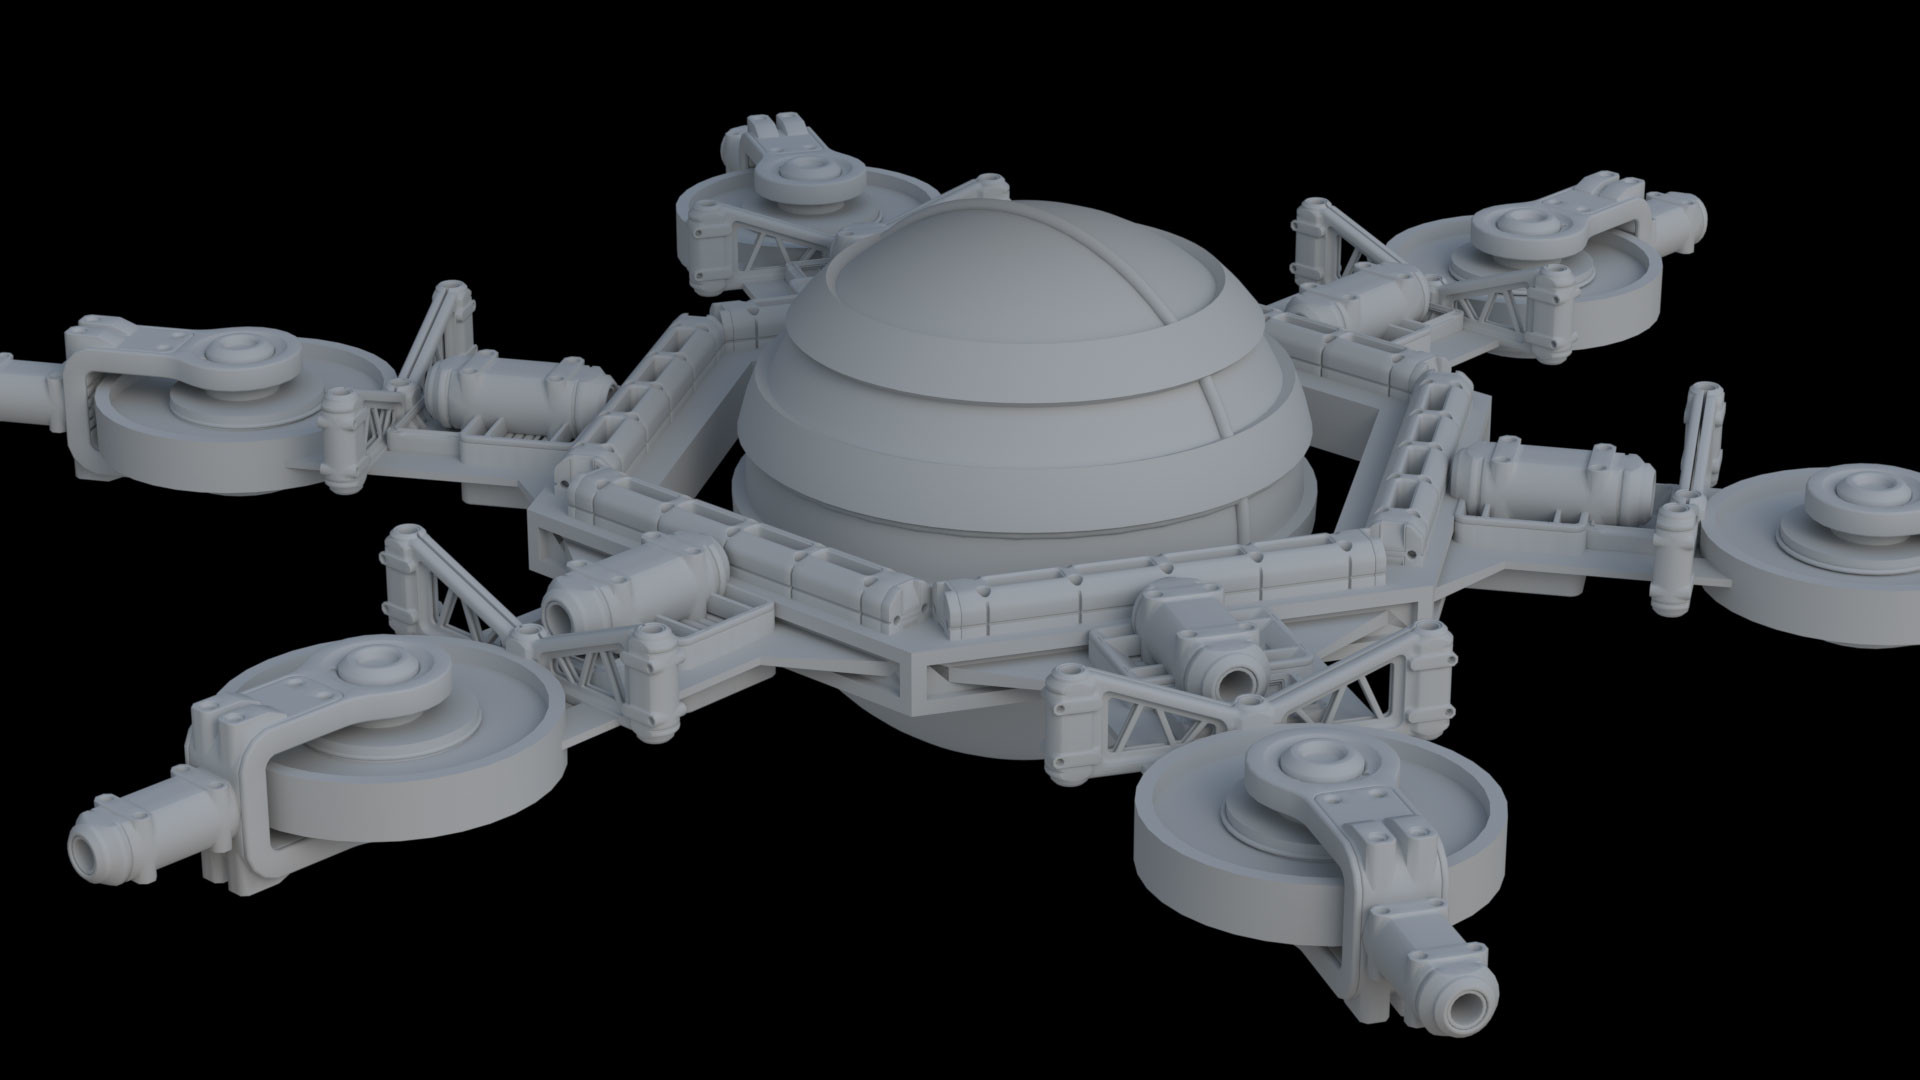 Michelangelo girardi orbital ig clay